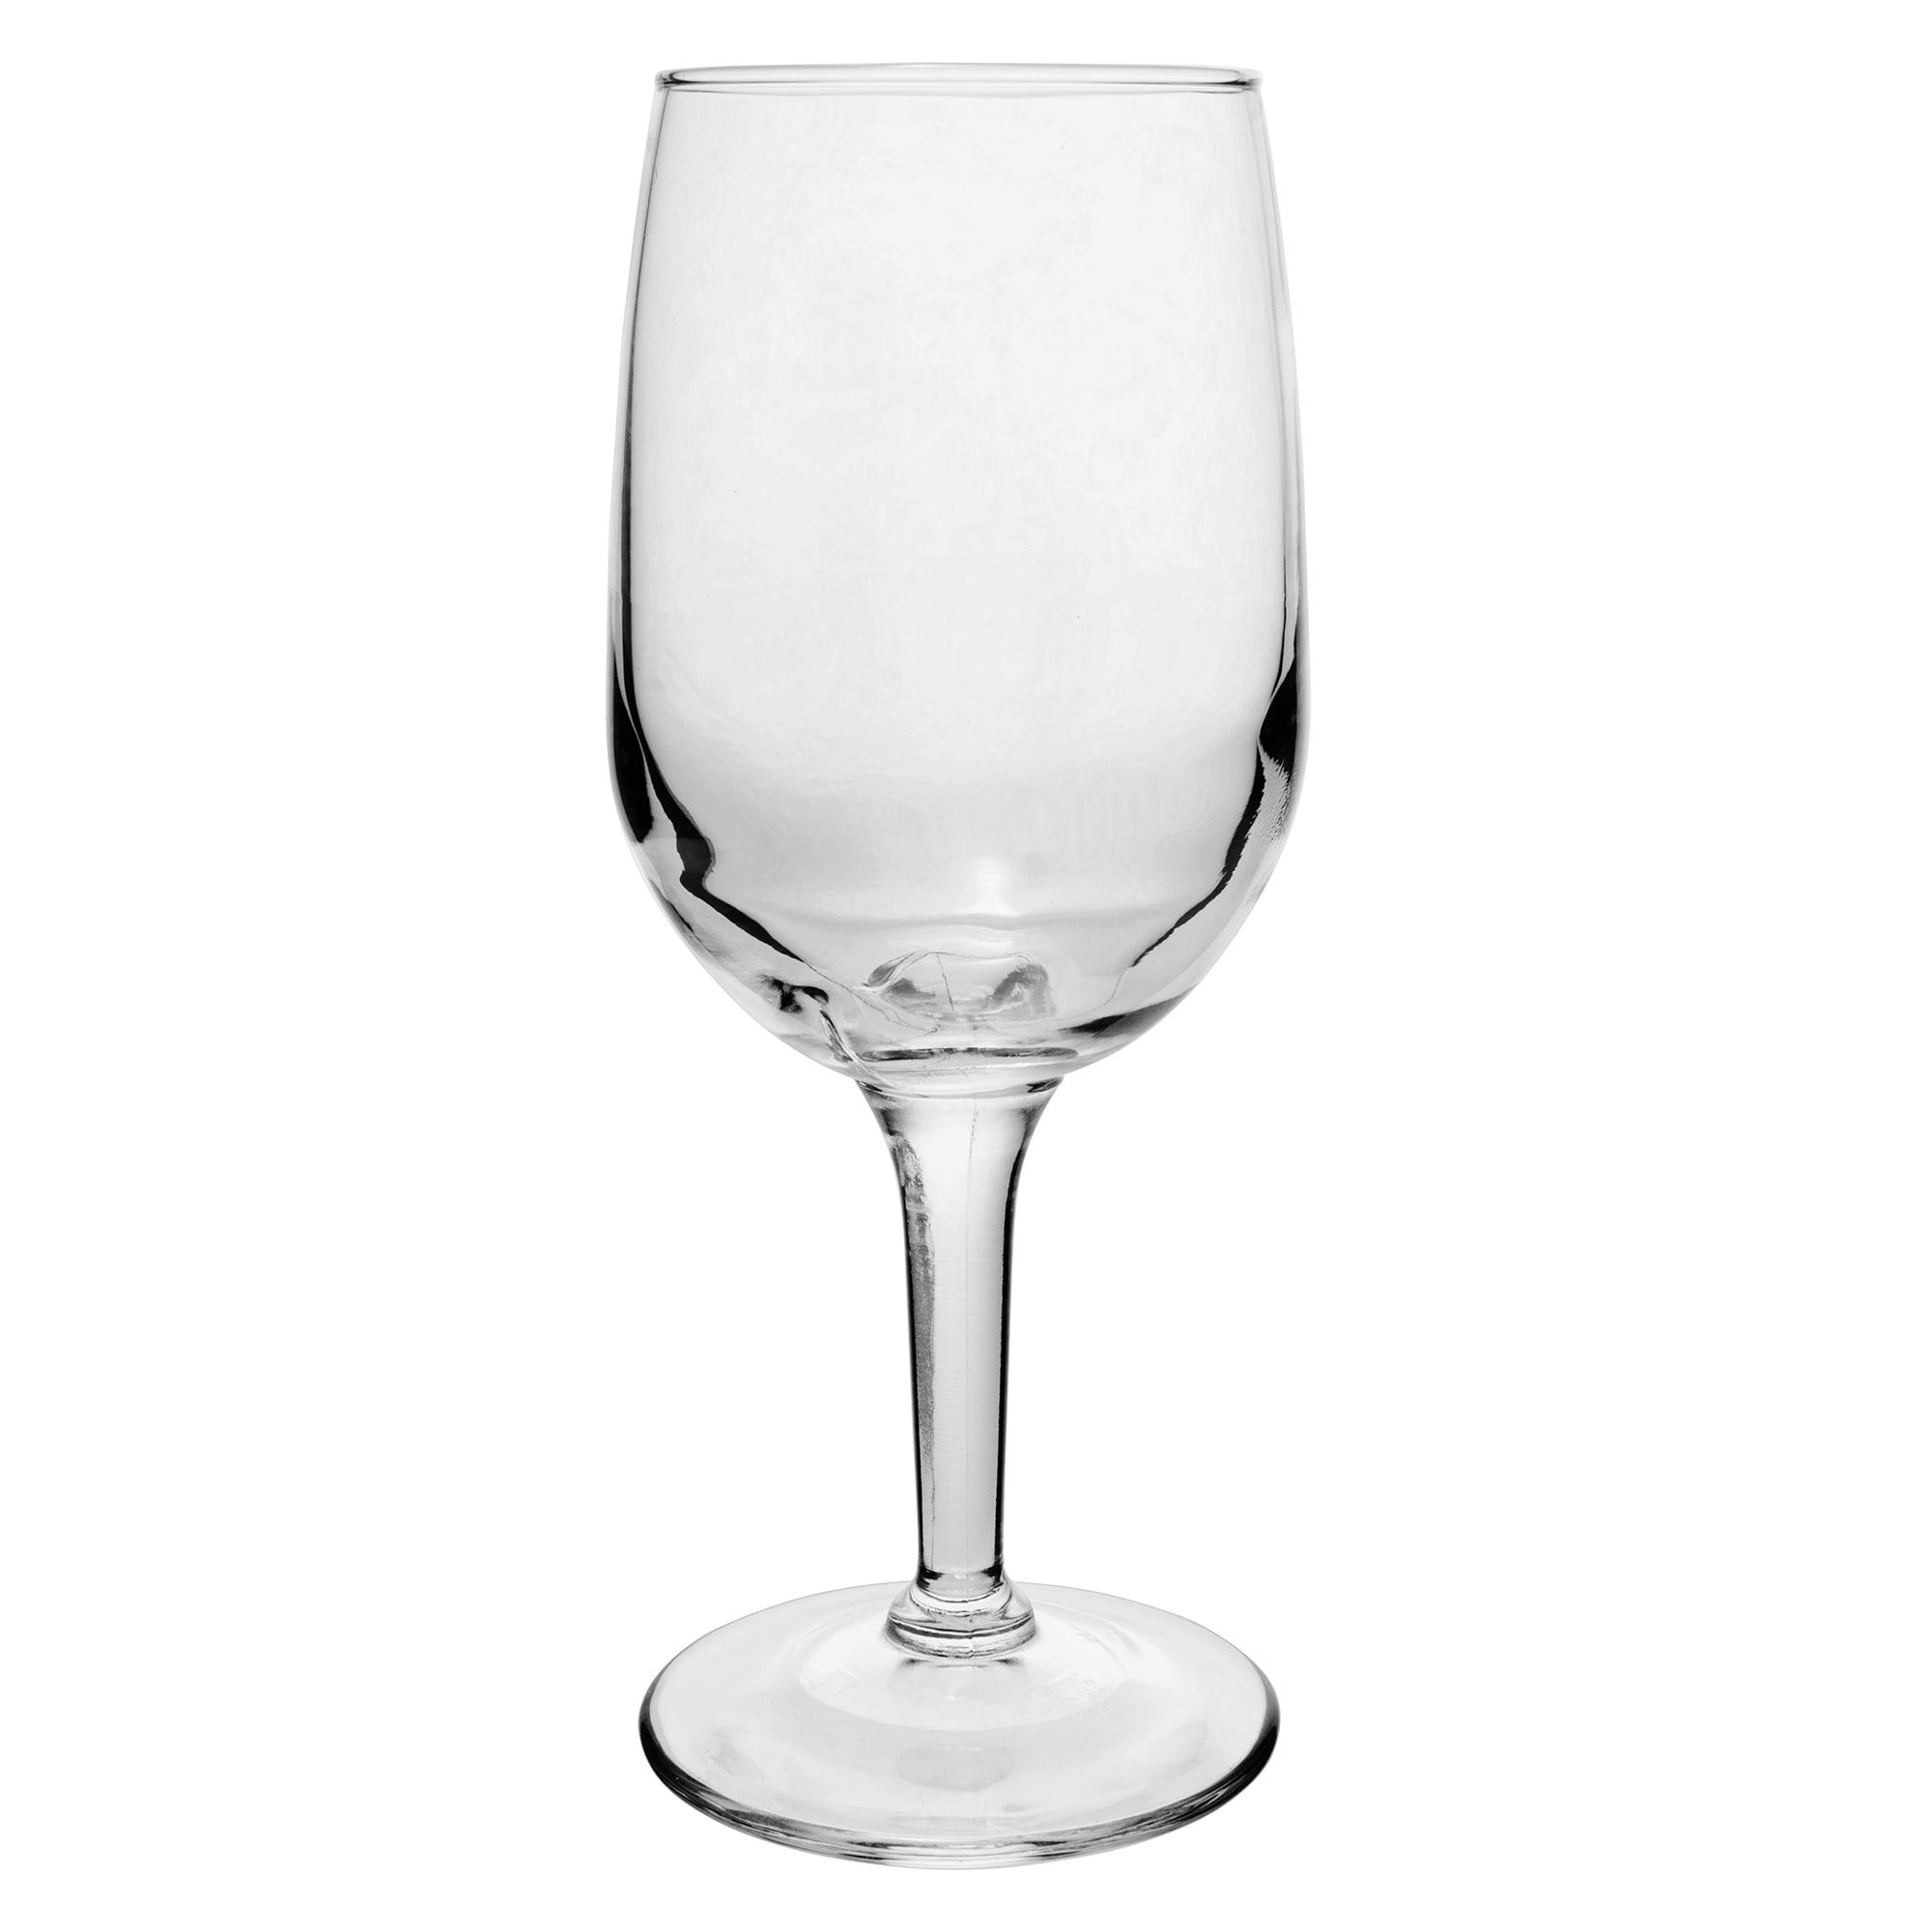 Libbey 8466 6.5-oz Citation Wine Glass - Safedge Rim Guarantee